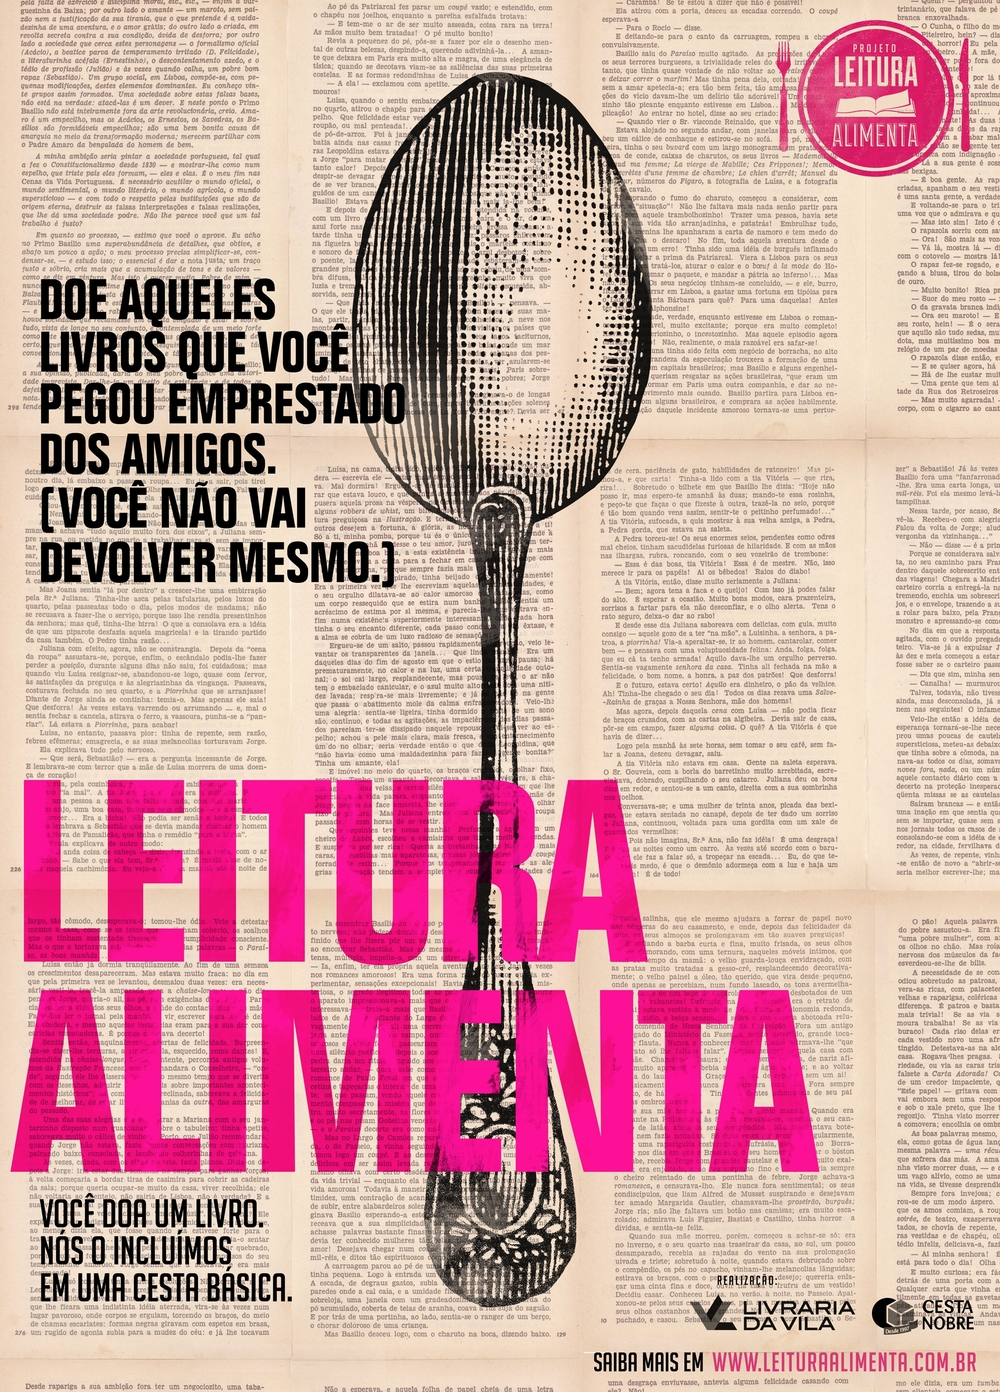 POSTER LEITURA 01.jpg